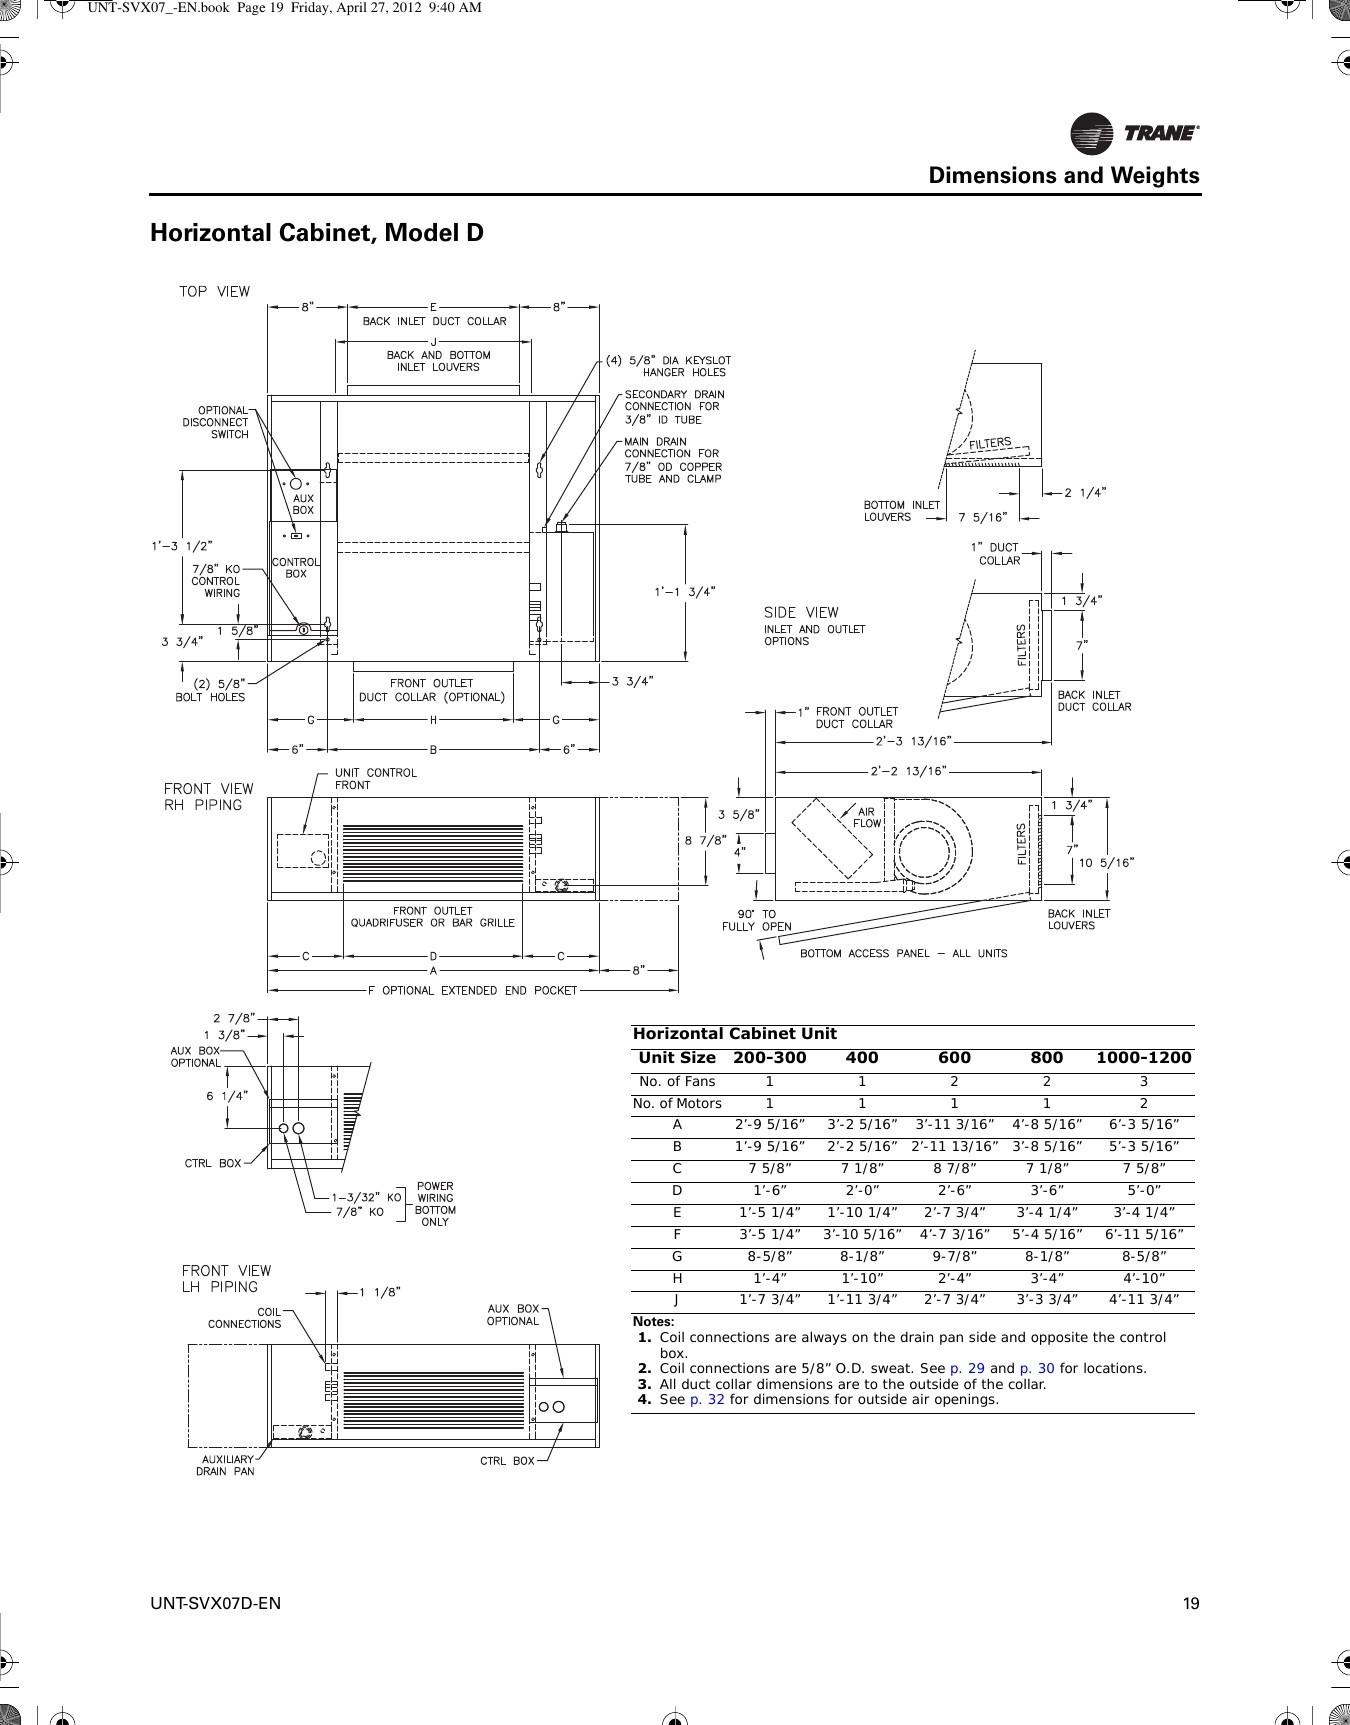 Trane Xe 1200 heat pump manual Operation